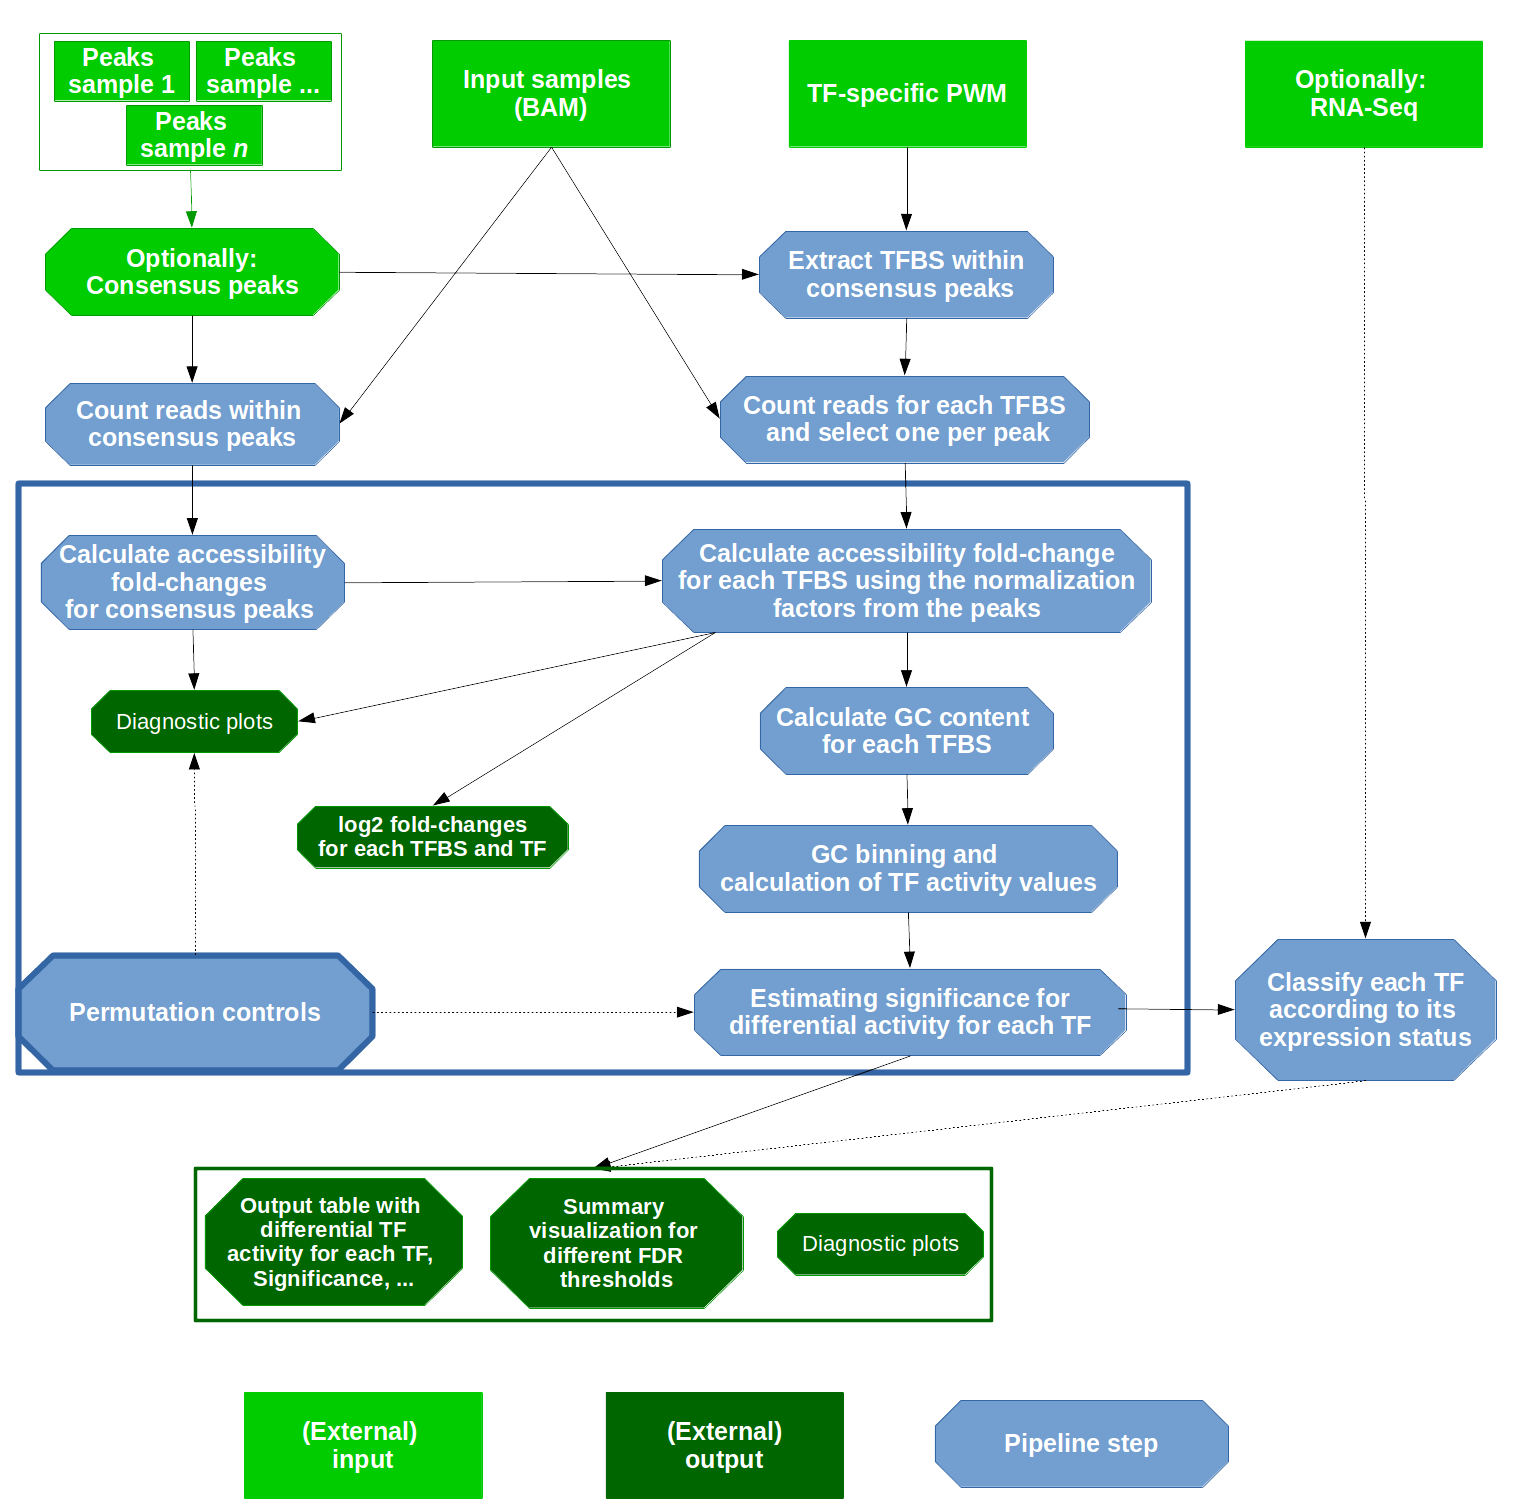 docs/Figures/Workflow_transparent.png